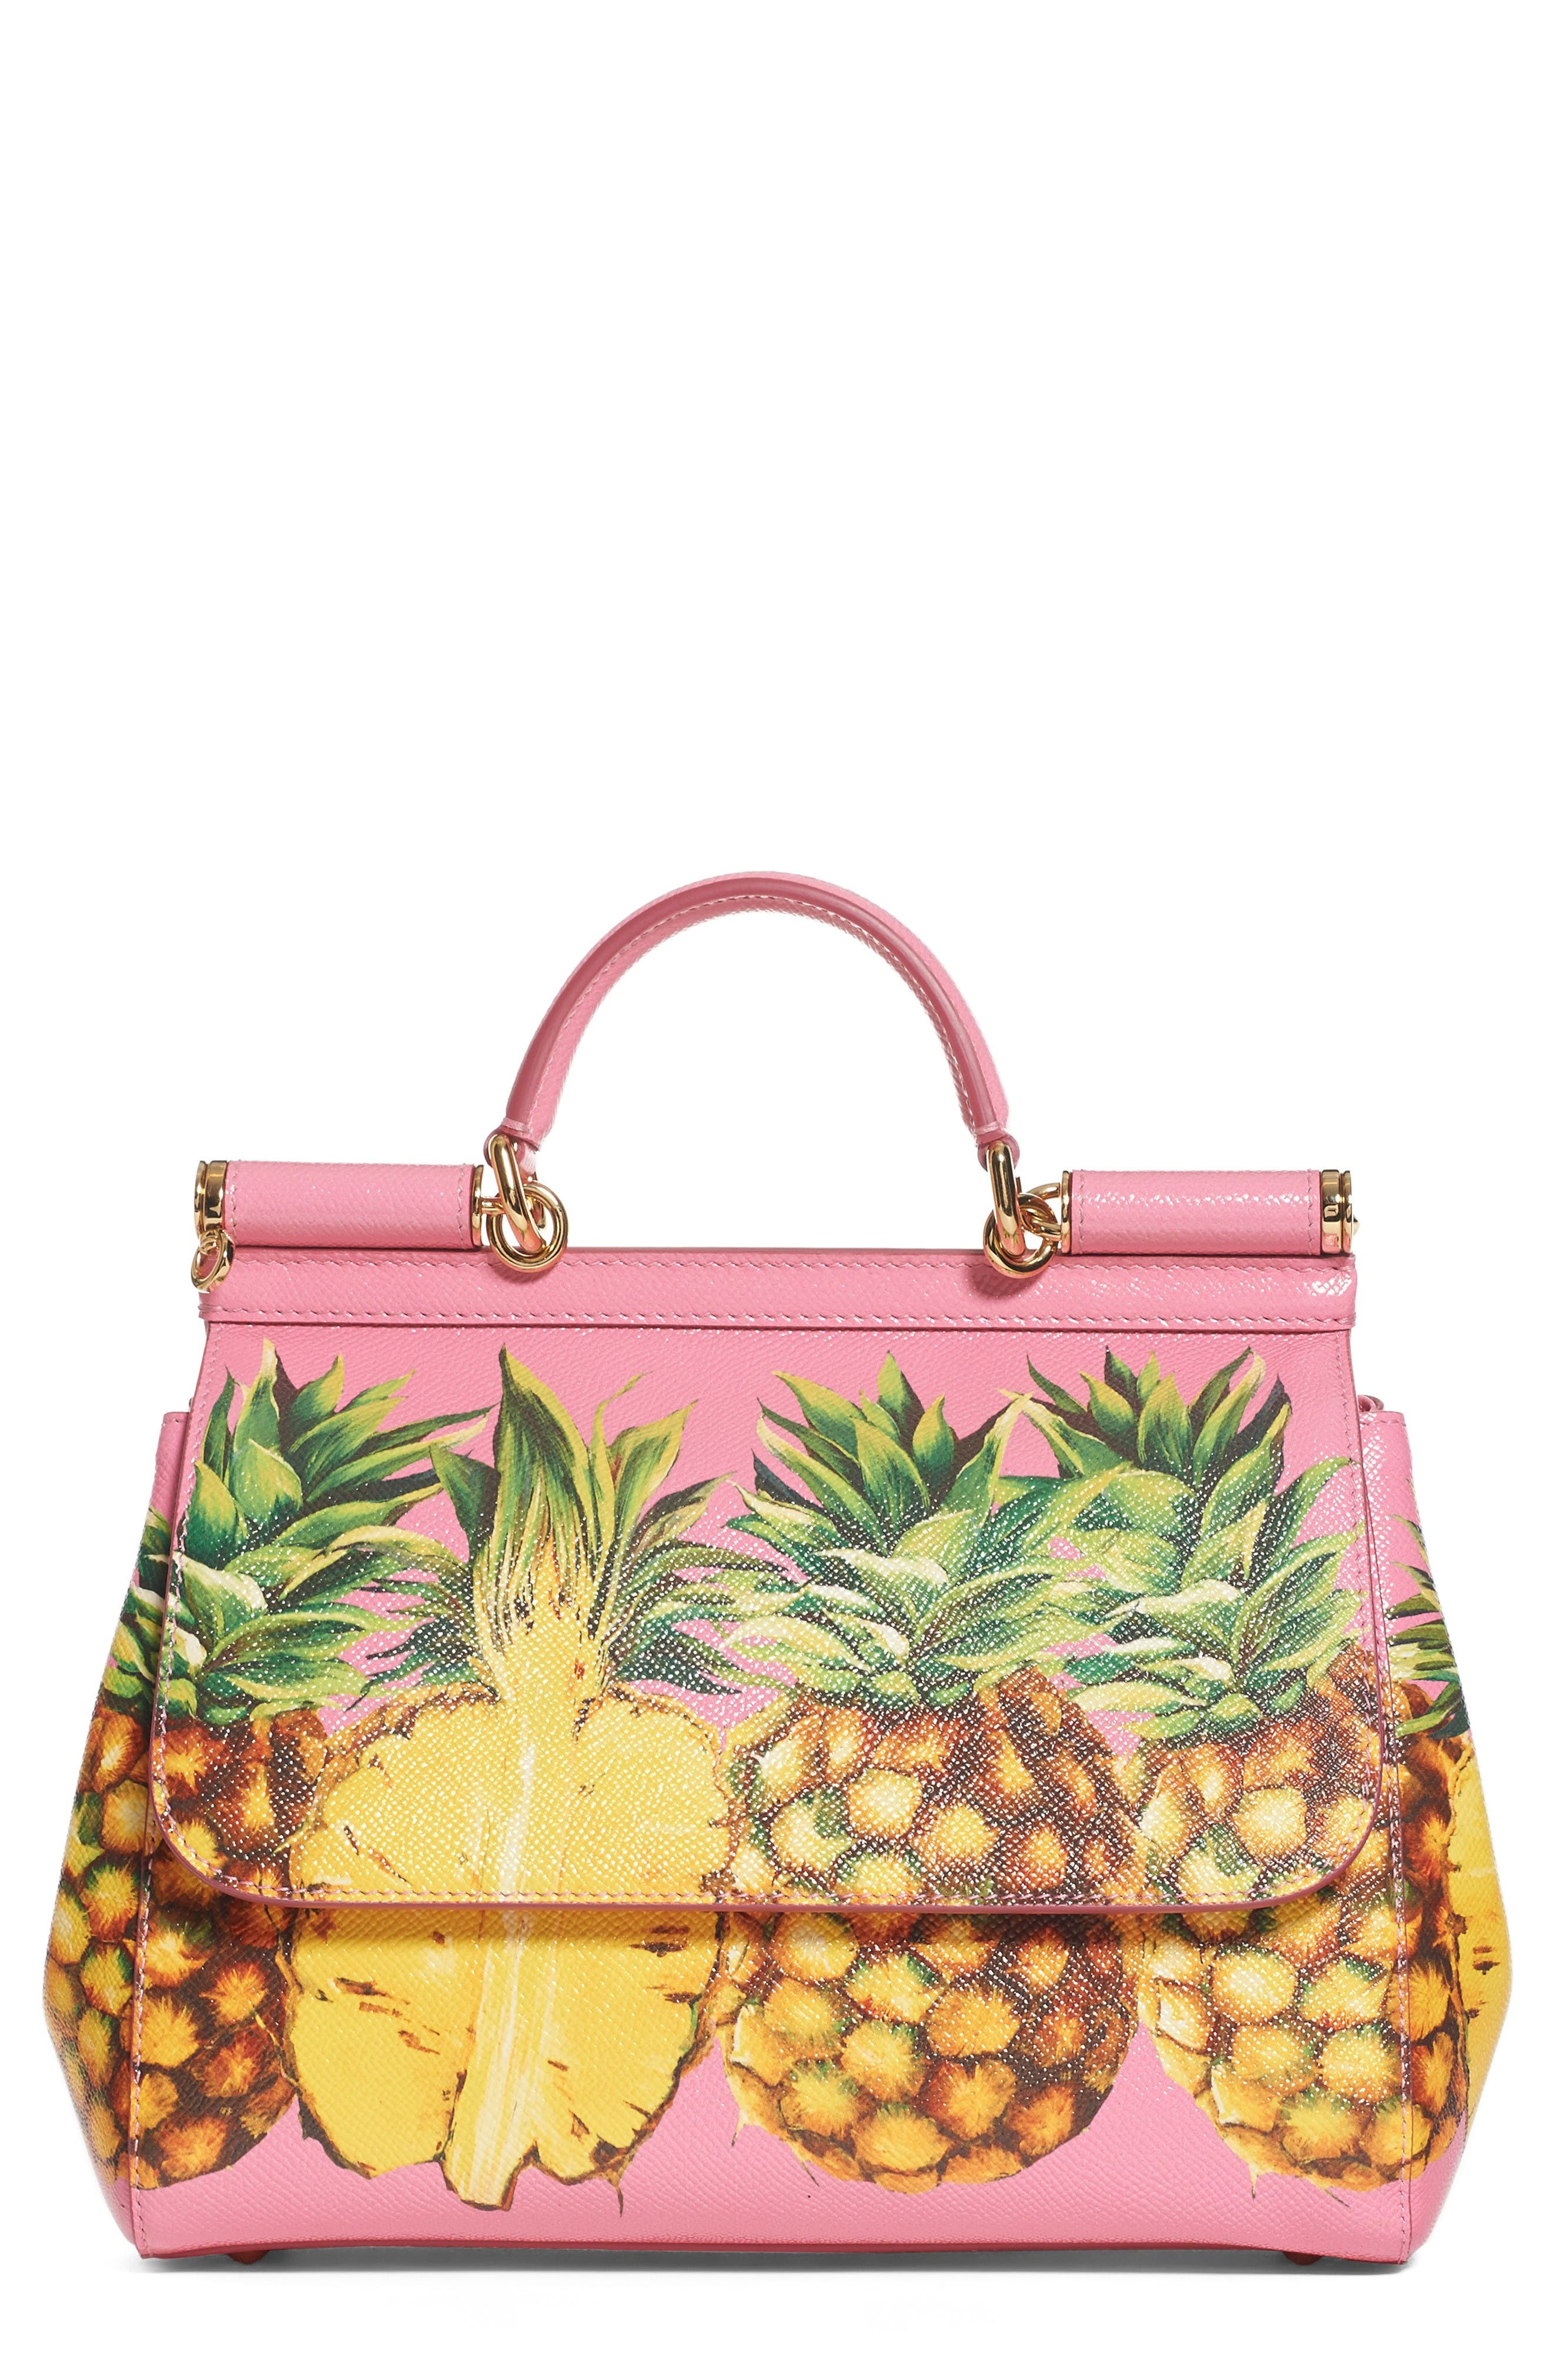 Main Image - Dolce&Gabbana Miss Sicily Pineapple Leather Satchel